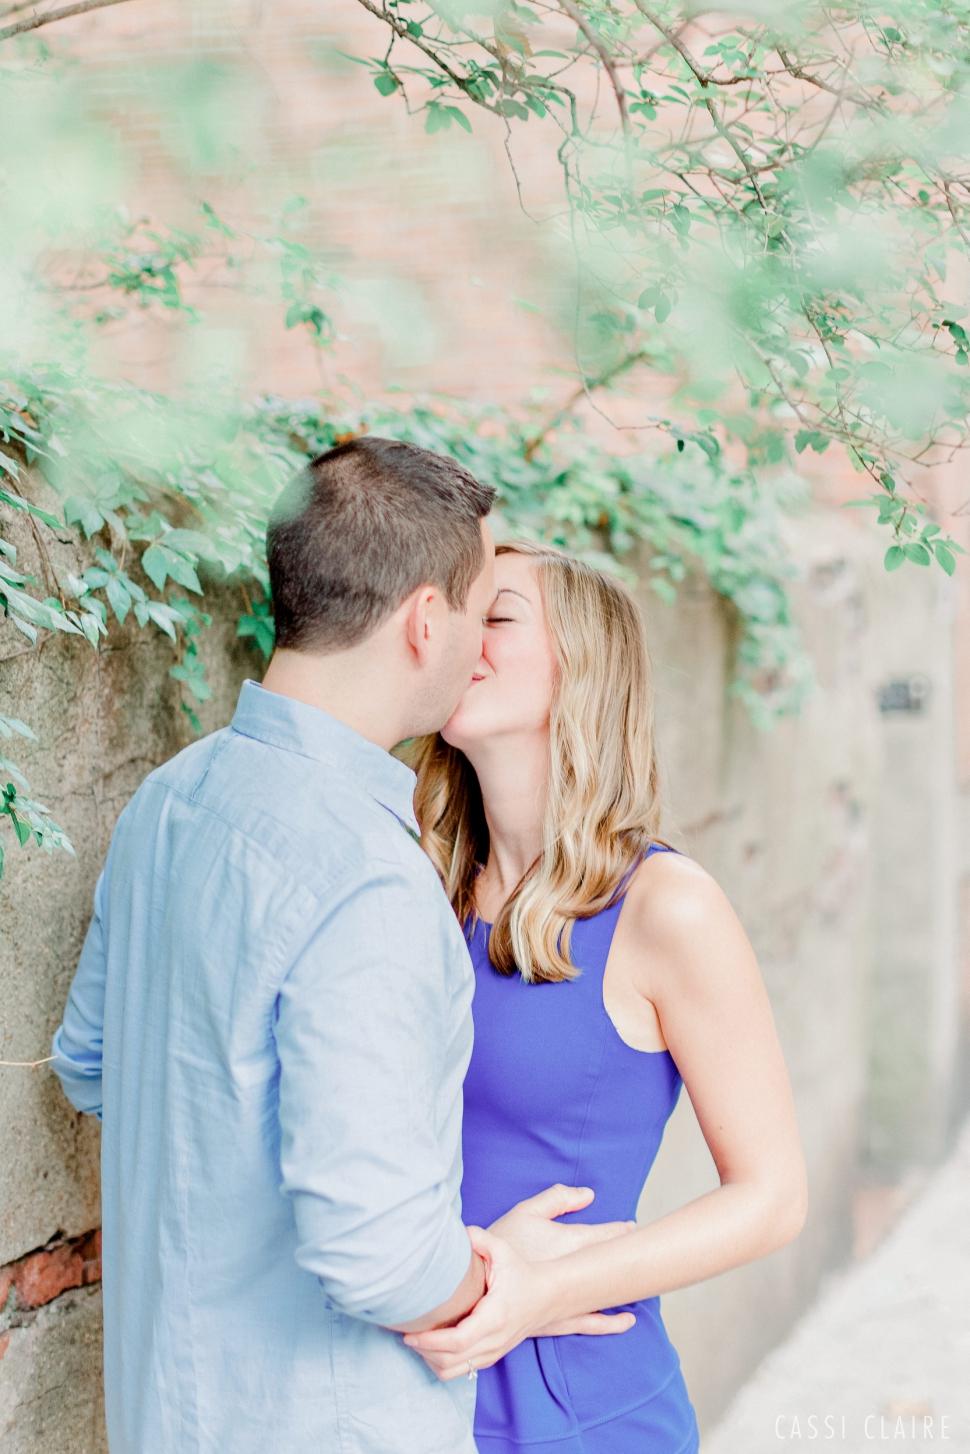 West-Village-Engagement-Photos-NYC-Wedding-Photographer_02.jpg